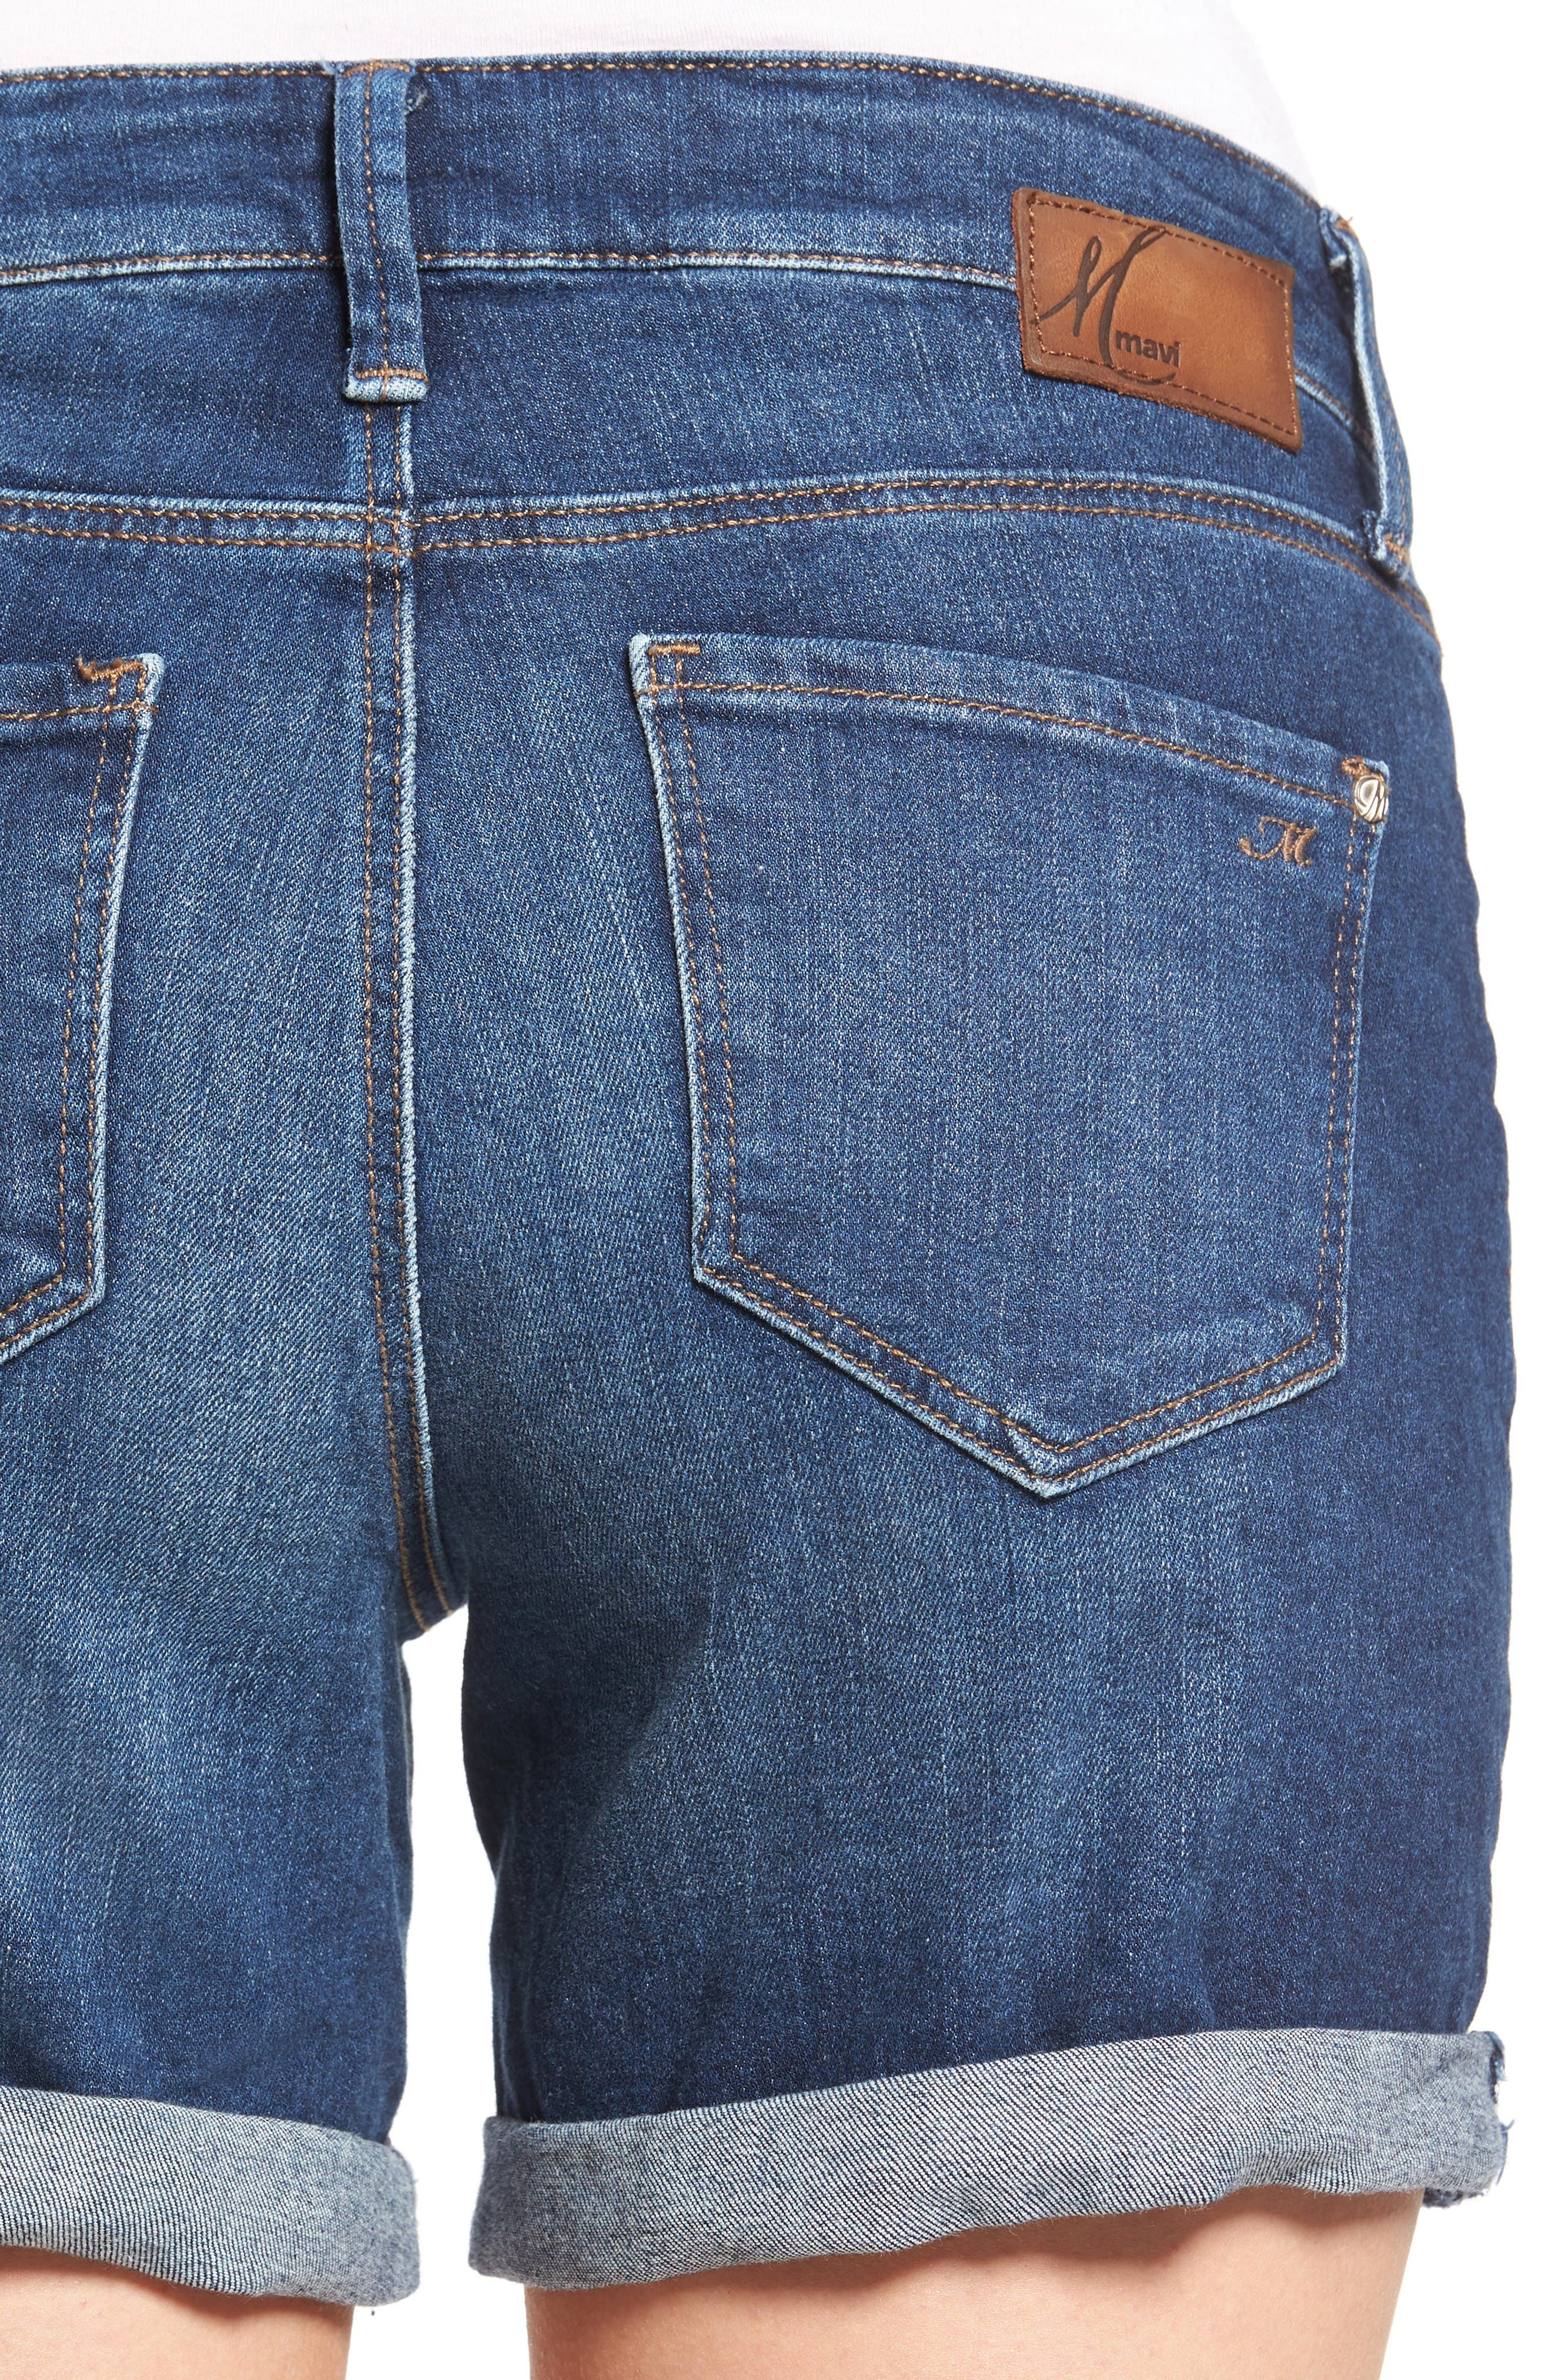 Marla Roll Cuff Denim Shorts,                             Alternate thumbnail 4, color,                             Dark